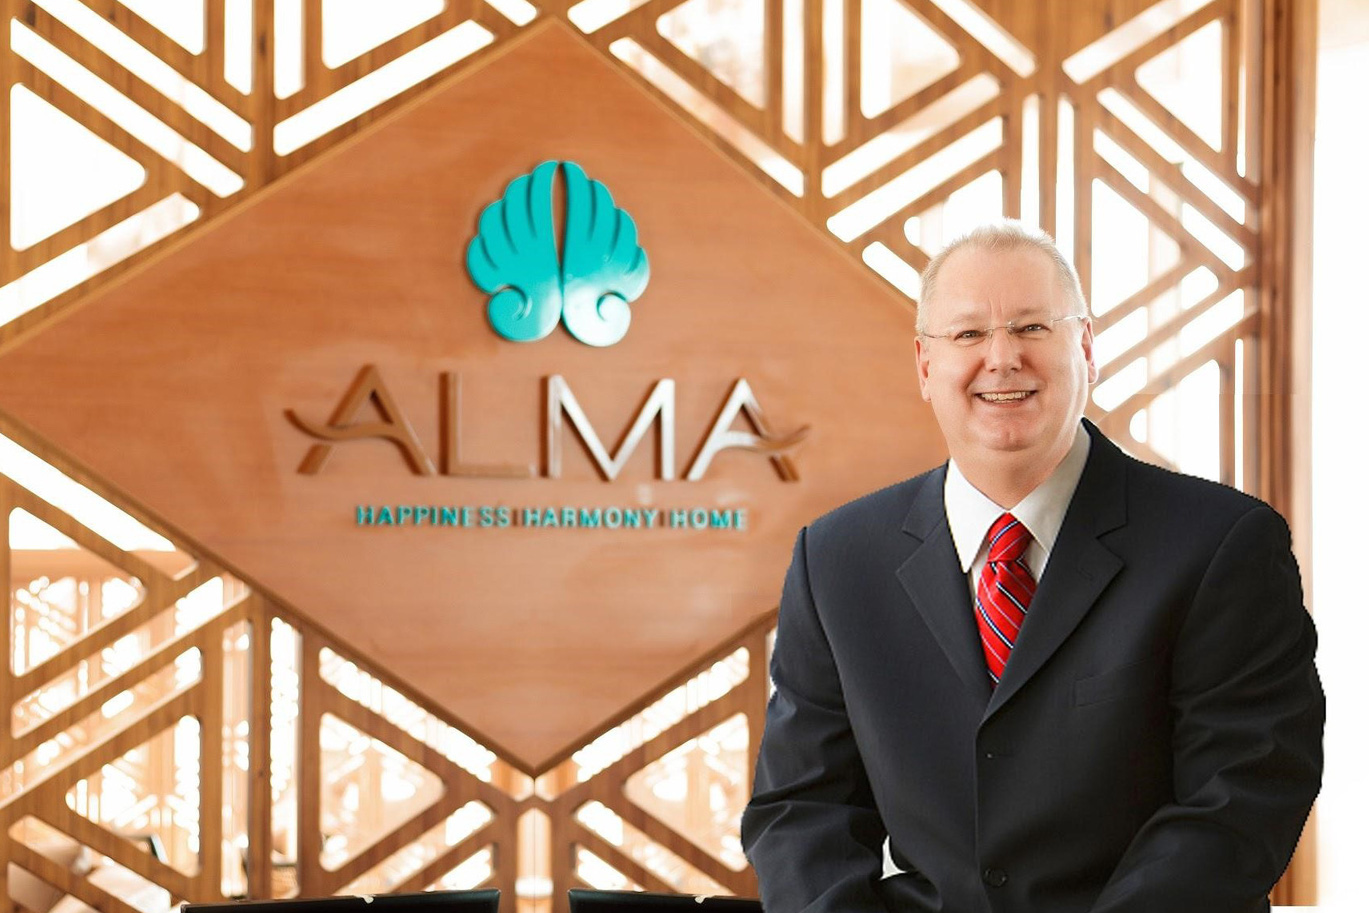 alma-crop